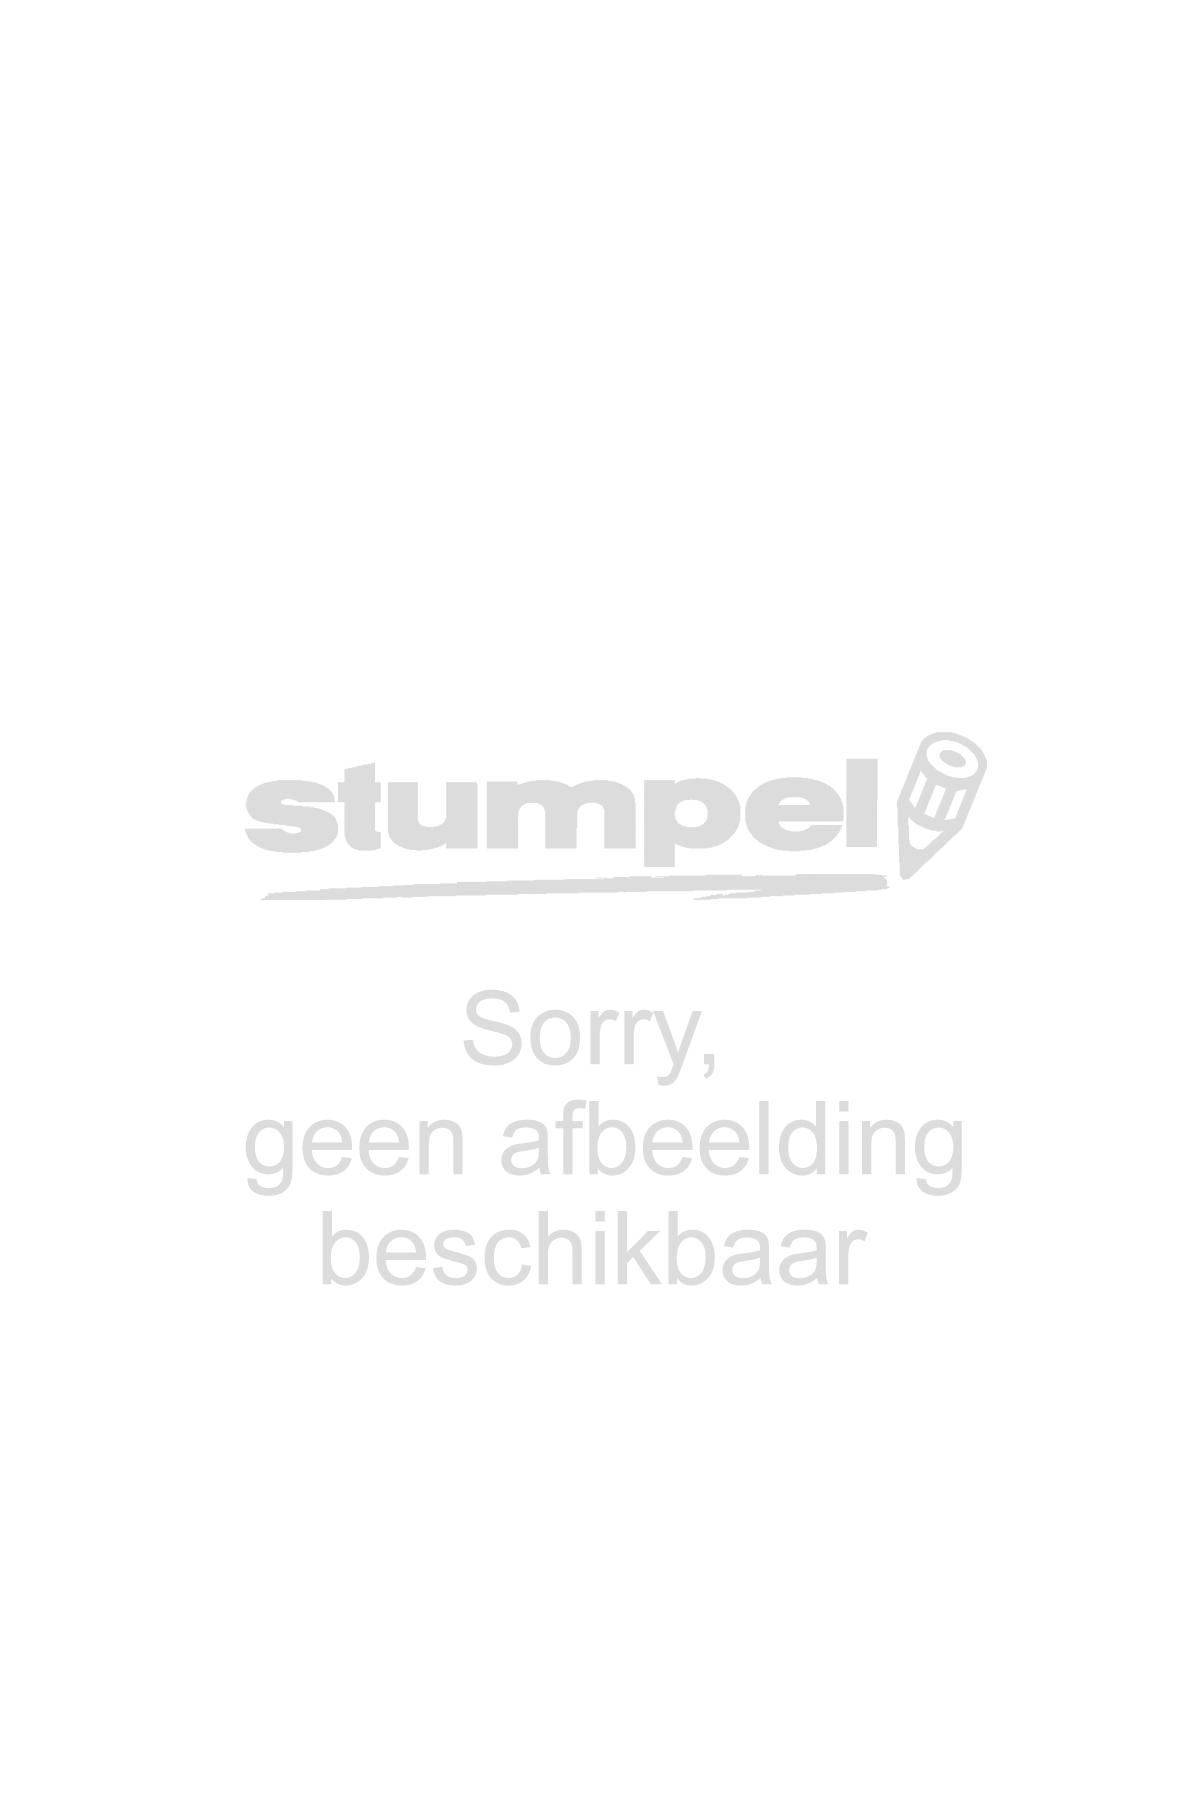 puntenslijper-lamy-4plus-10583285